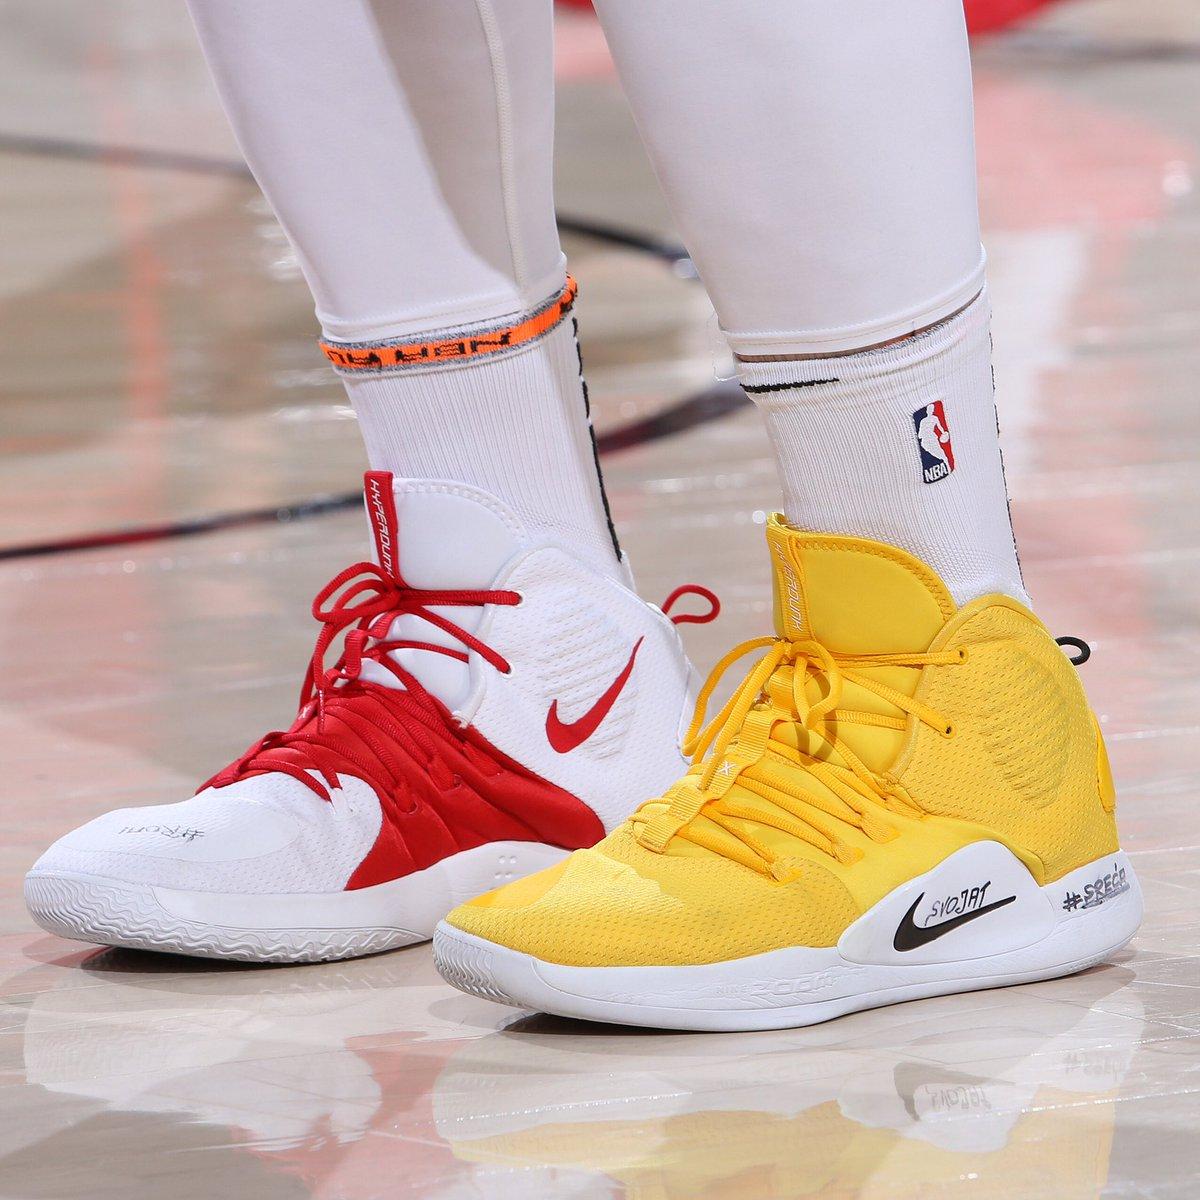 ❤️ or 💛 #NBAKicks?   @bosnianbeast27  #RipCity